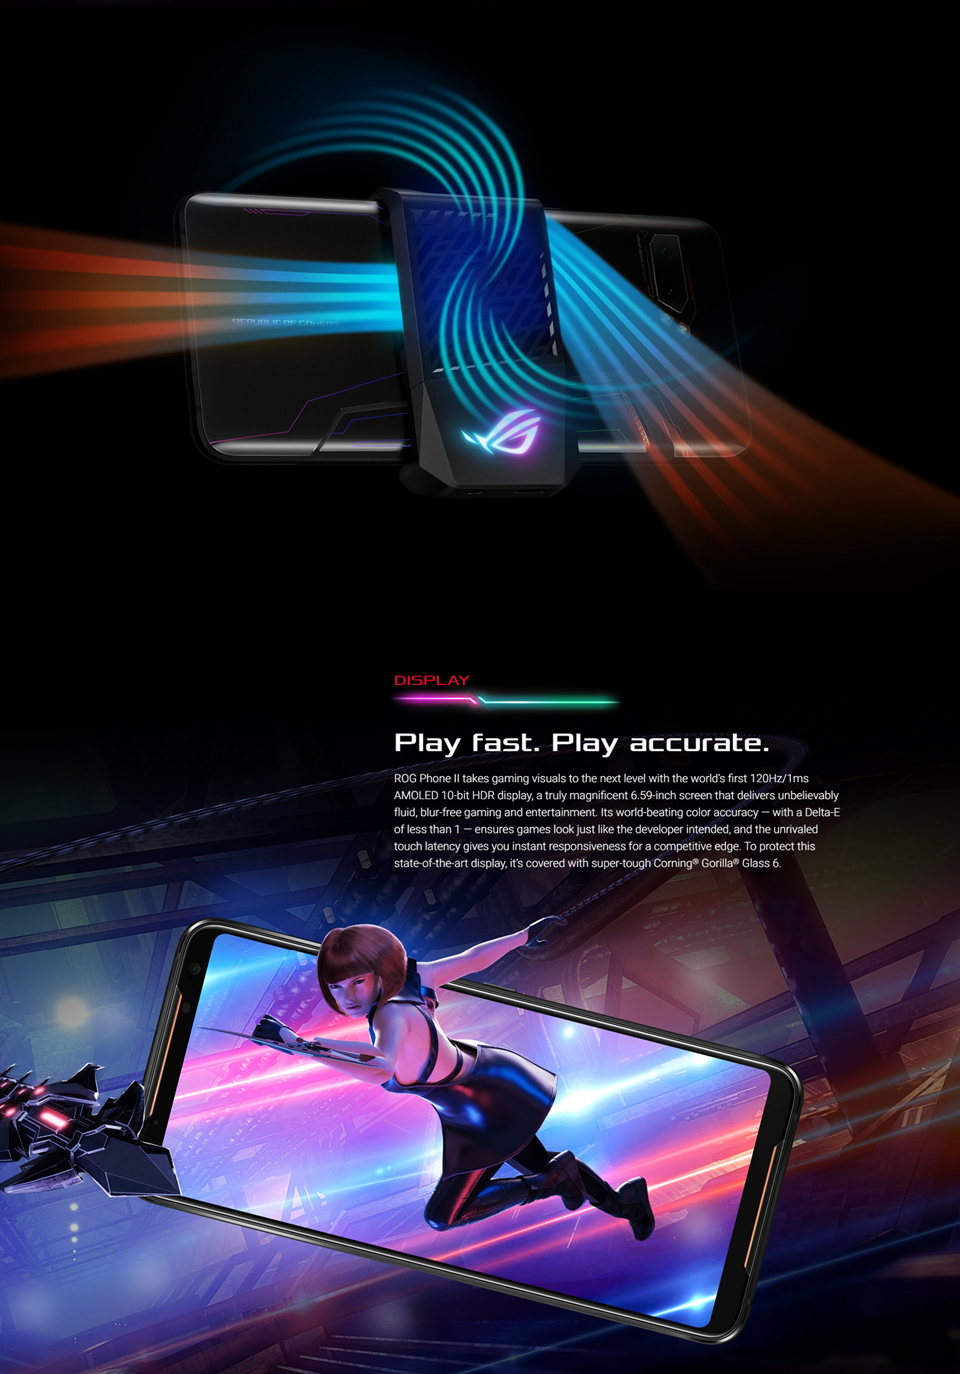 ROG-二代手机详情页_07